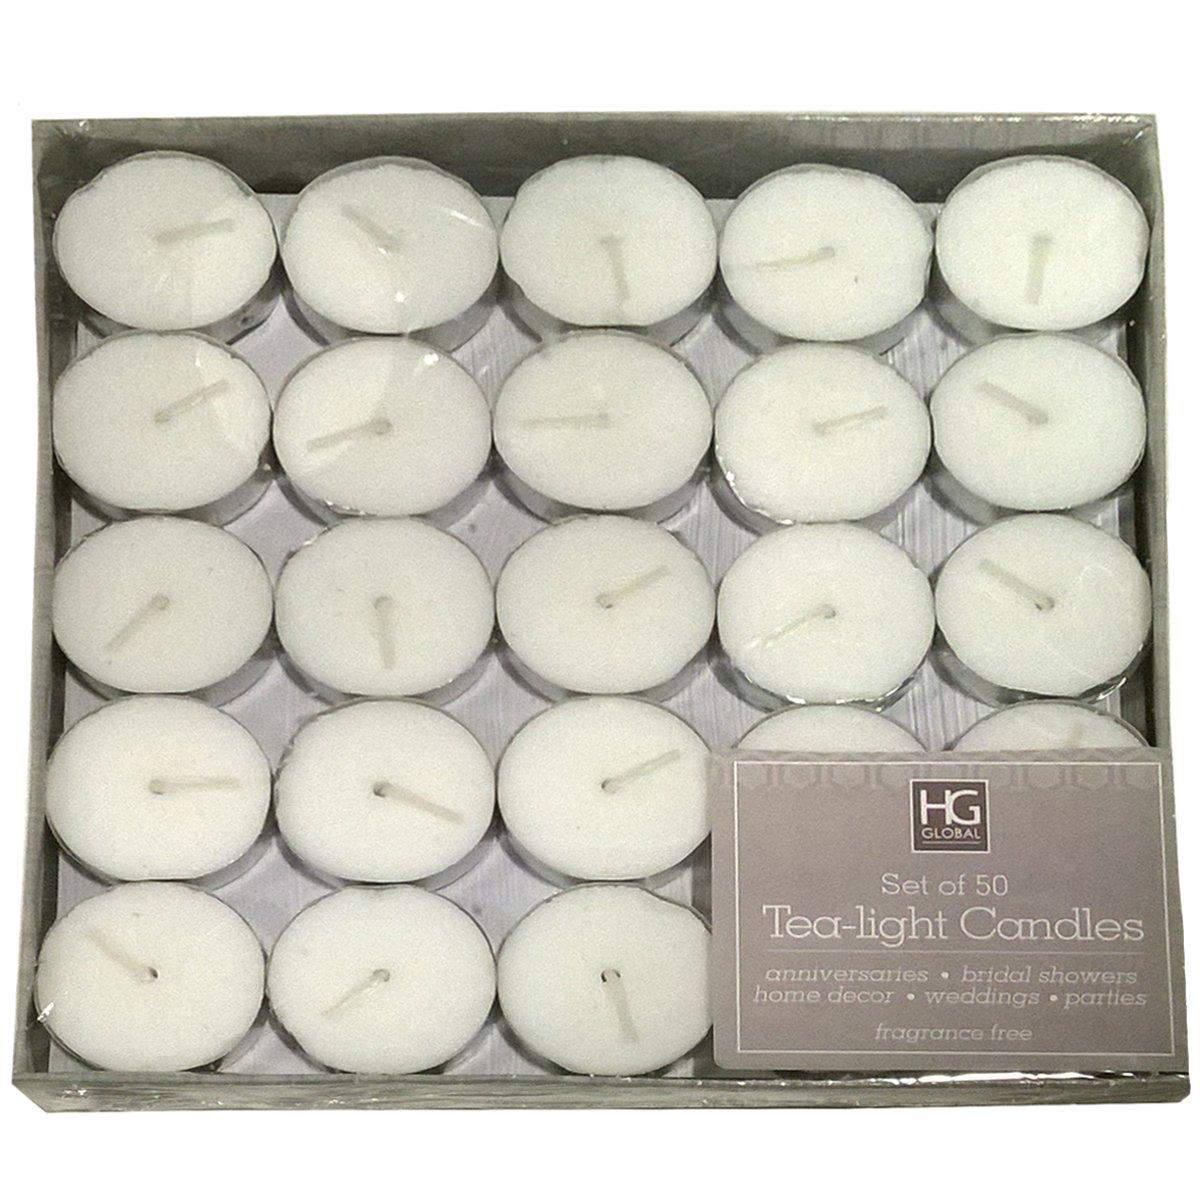 tea light candles unscented bulk buy quality tealights id ebay. Black Bedroom Furniture Sets. Home Design Ideas